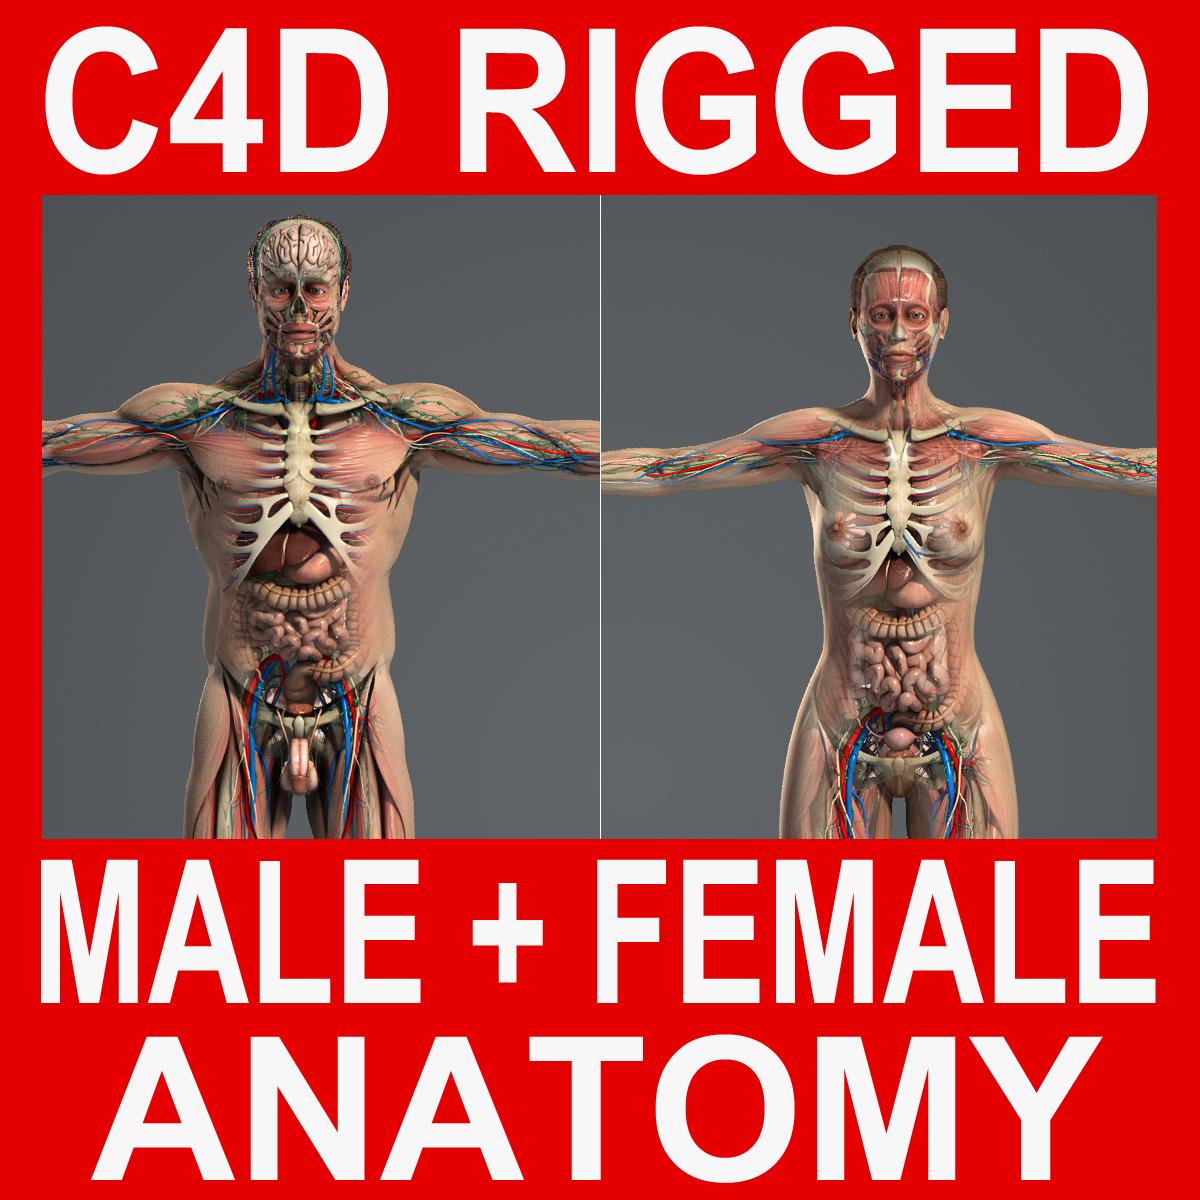 rigged male female anatomy c4d